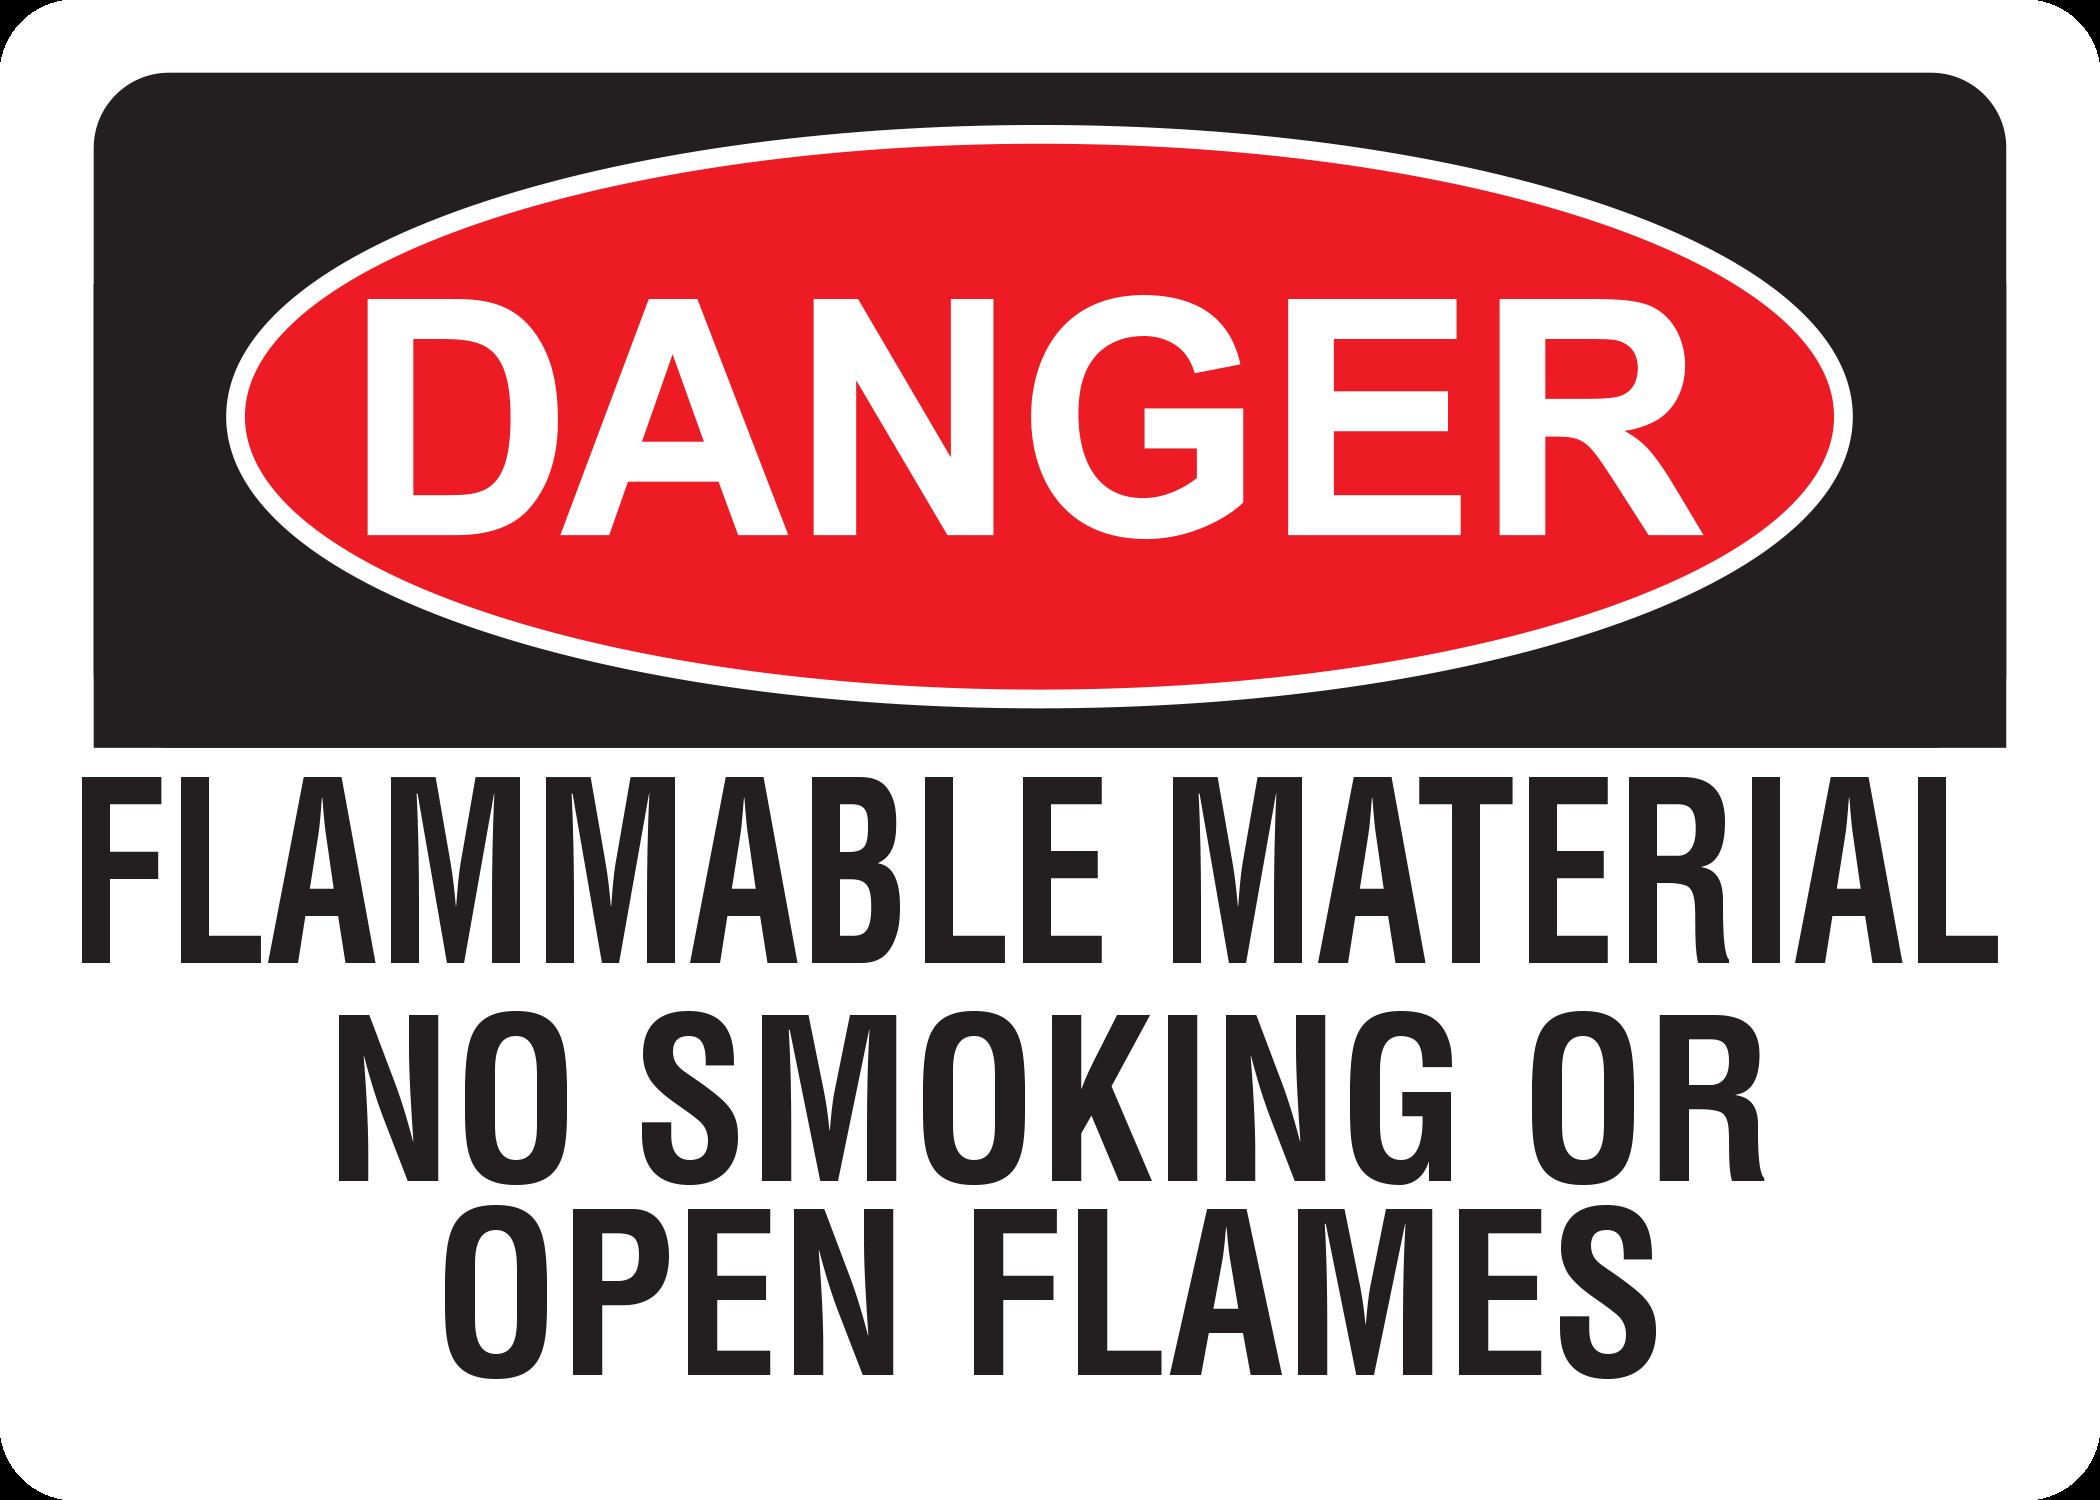 Danger Flammable Material